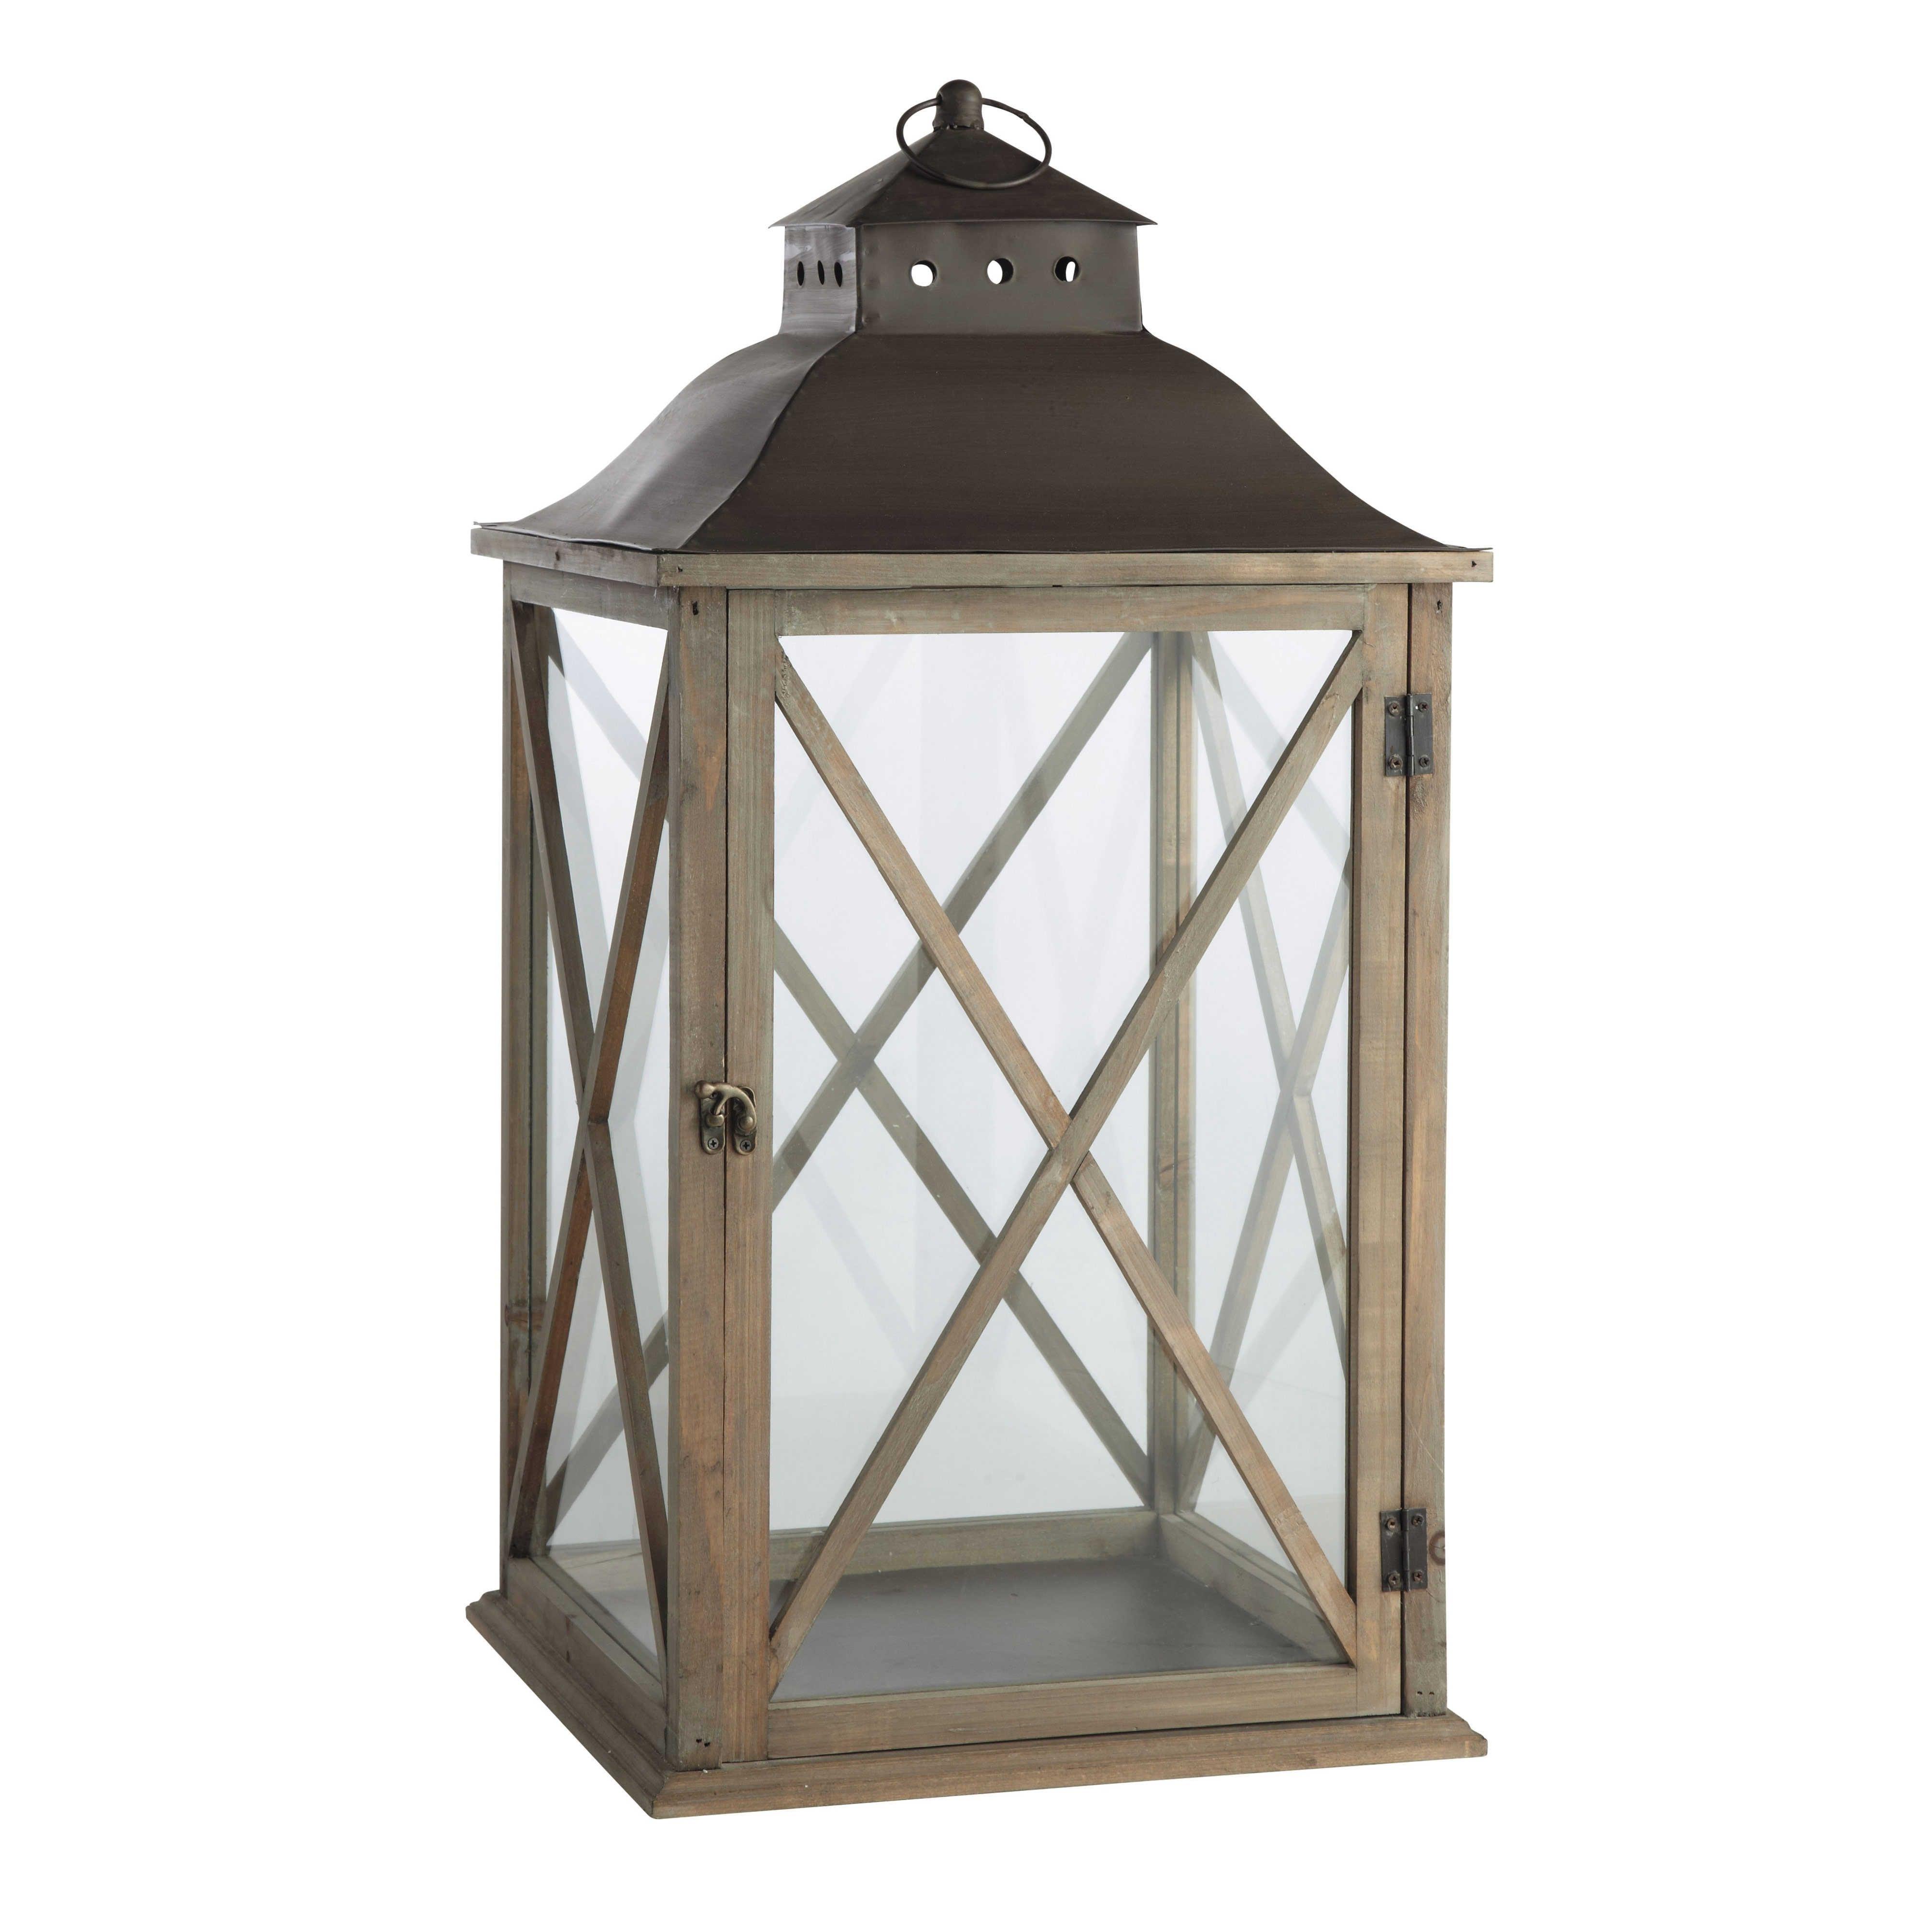 Most Popular Outdoor Wood Lanterns With Regard To Grey Wood Garden Lantern H 72cm (View 17 of 20)